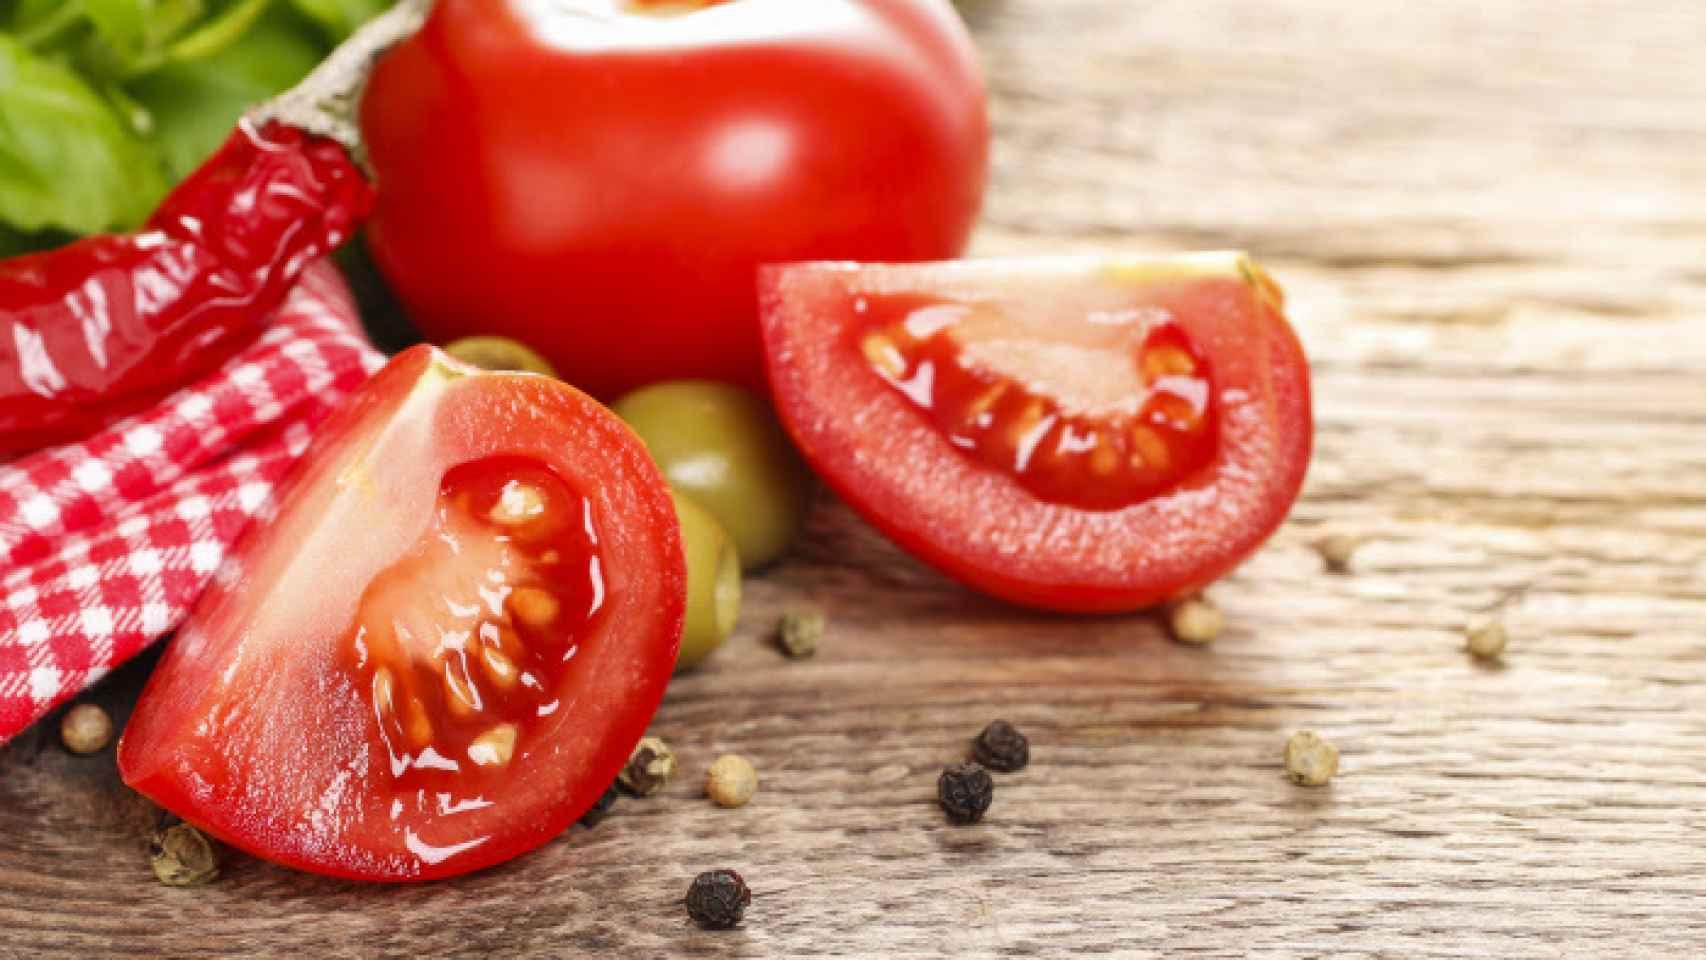 El tomate posee agentes antioxidantes.